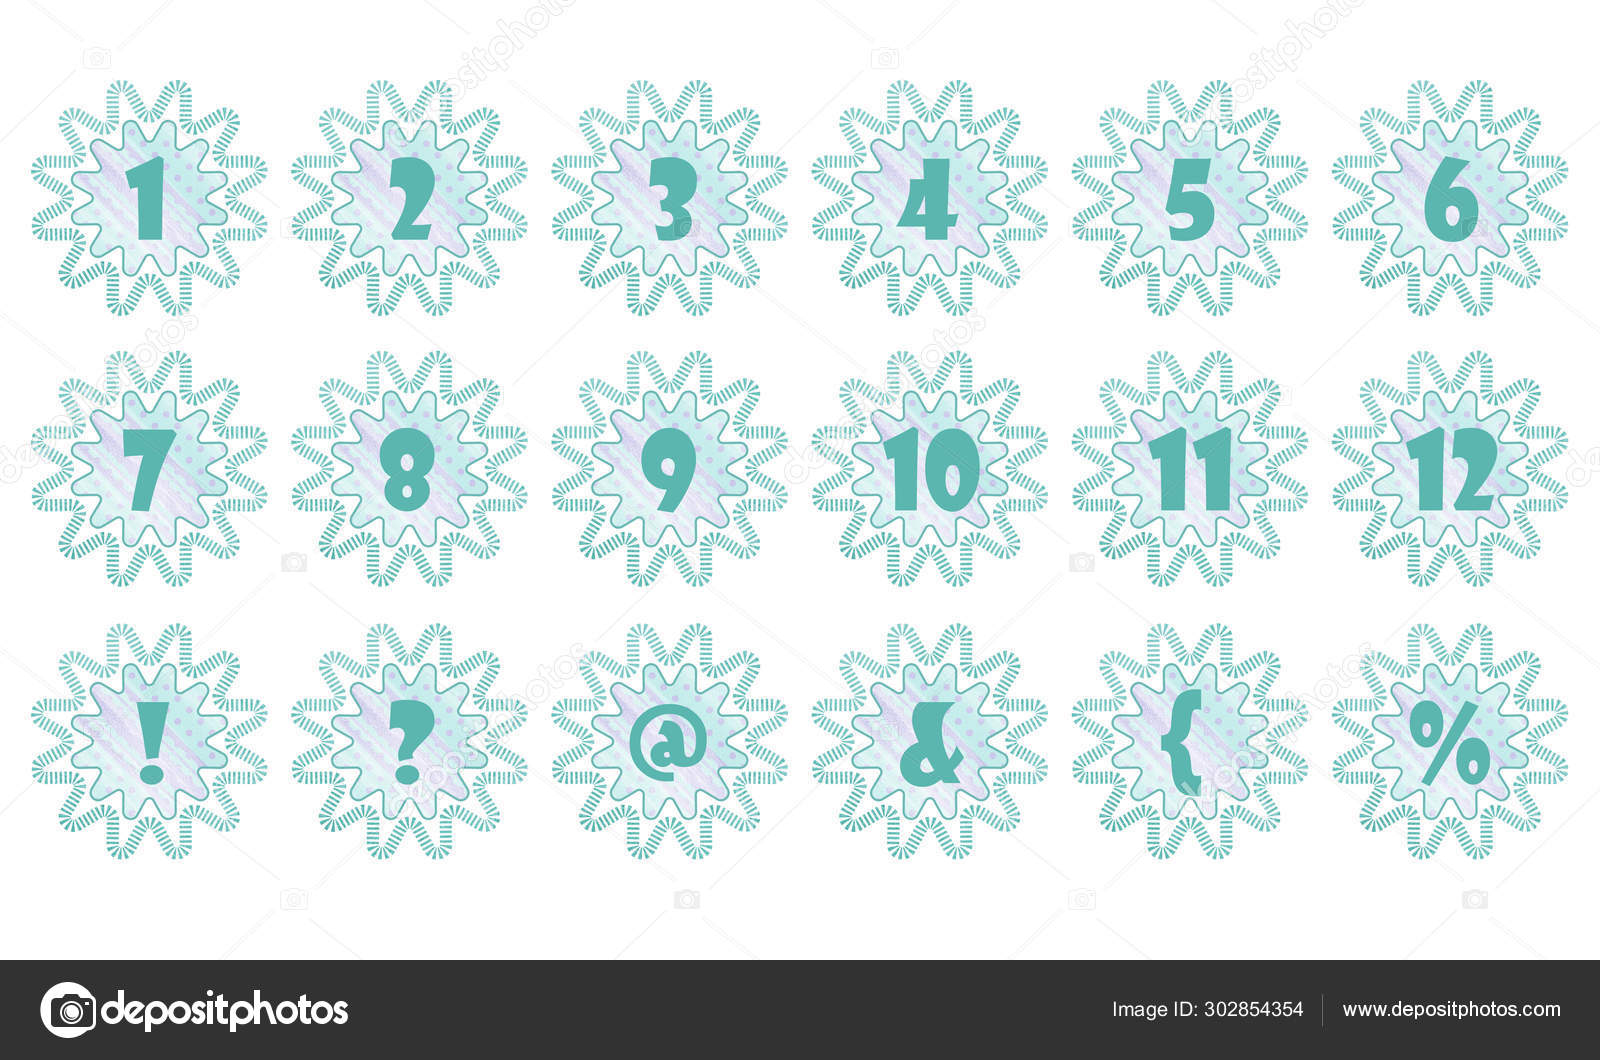 Abstract Figure Flower Number Element Scrapbooking Banner Postcard Design Project Stock Photo C Avdesigner9 302854354